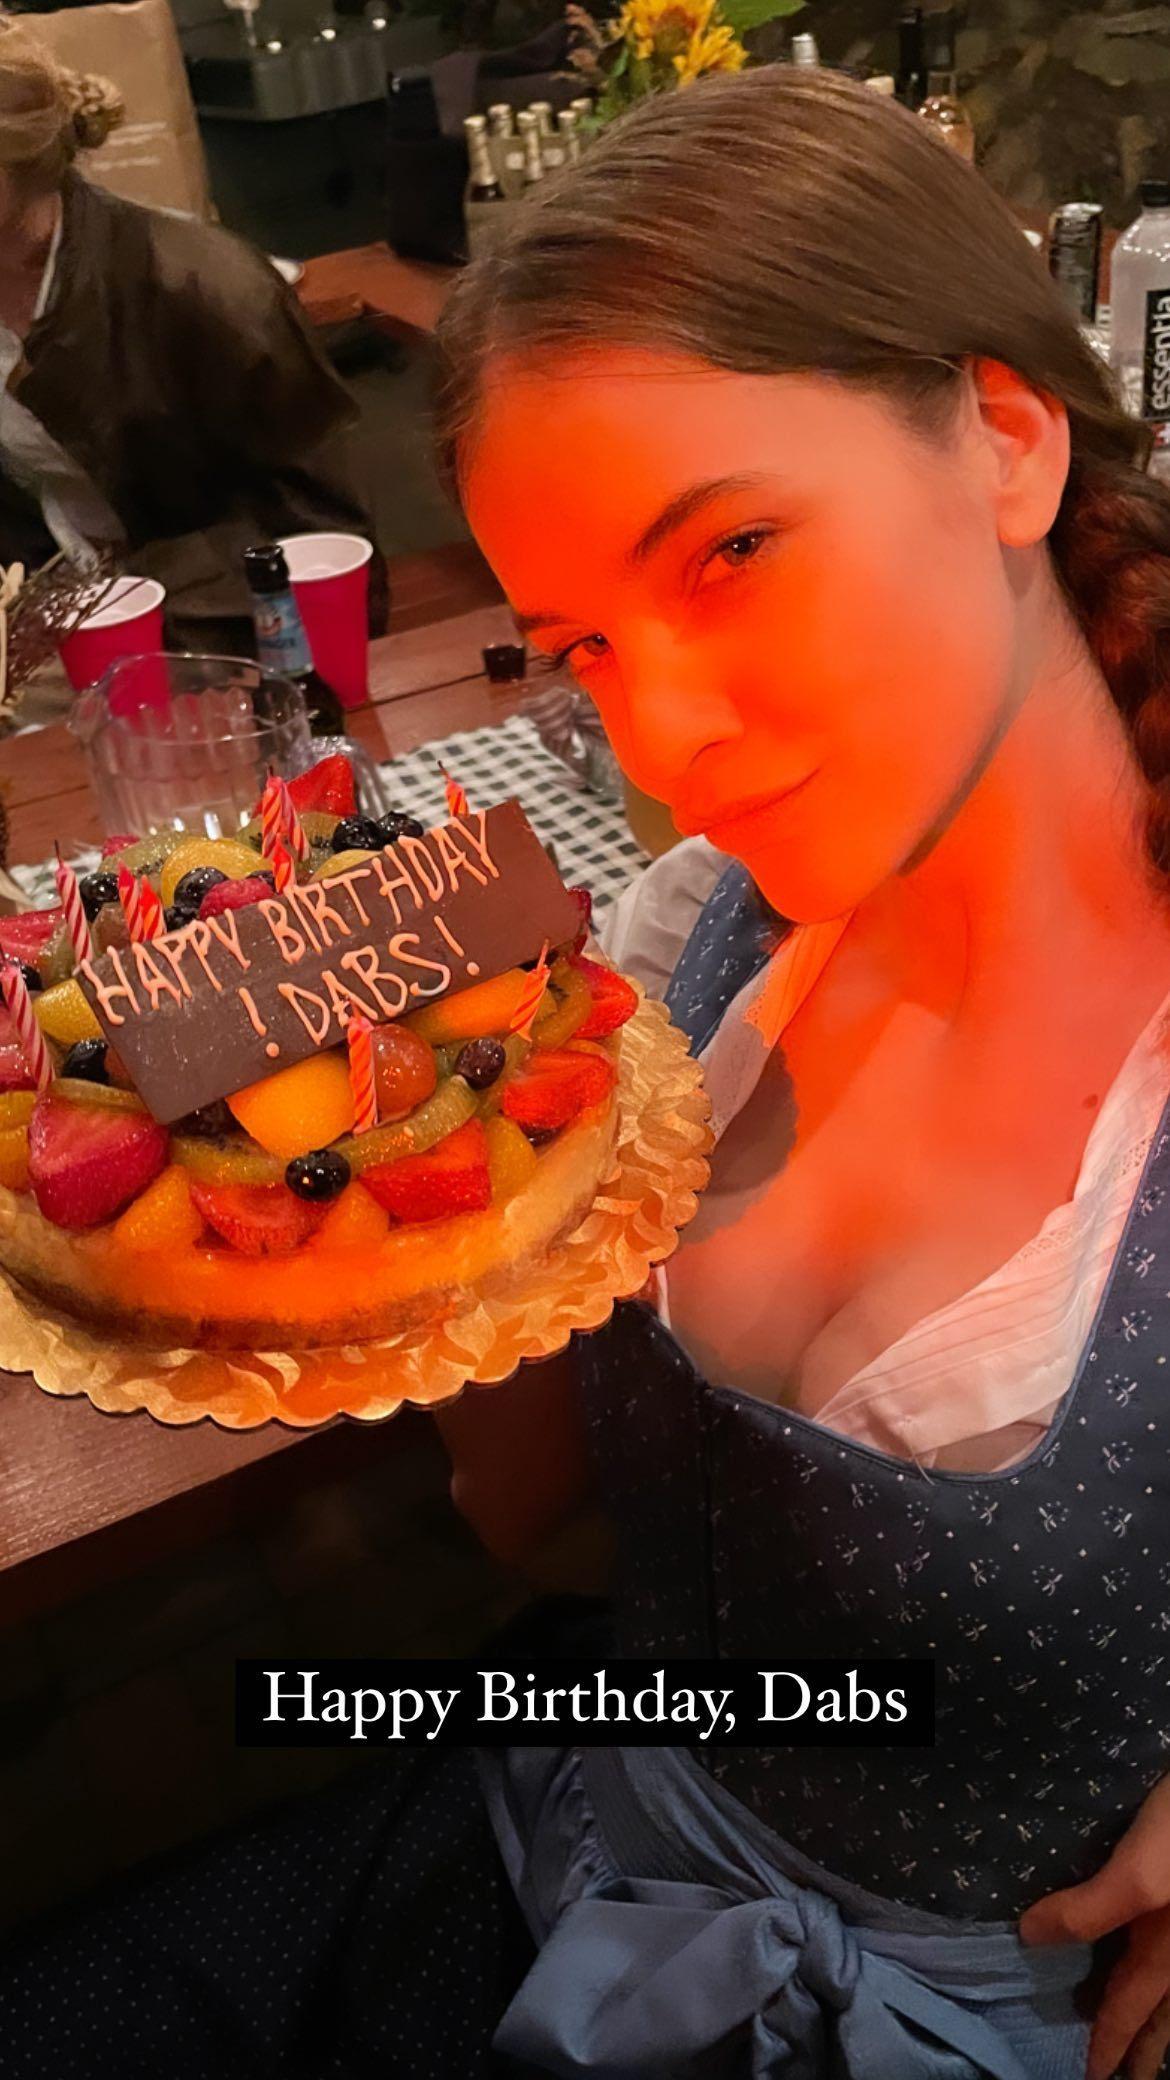 L?anniversaire de Barbara Palvin à l?Oktoberfest! - Photo 3